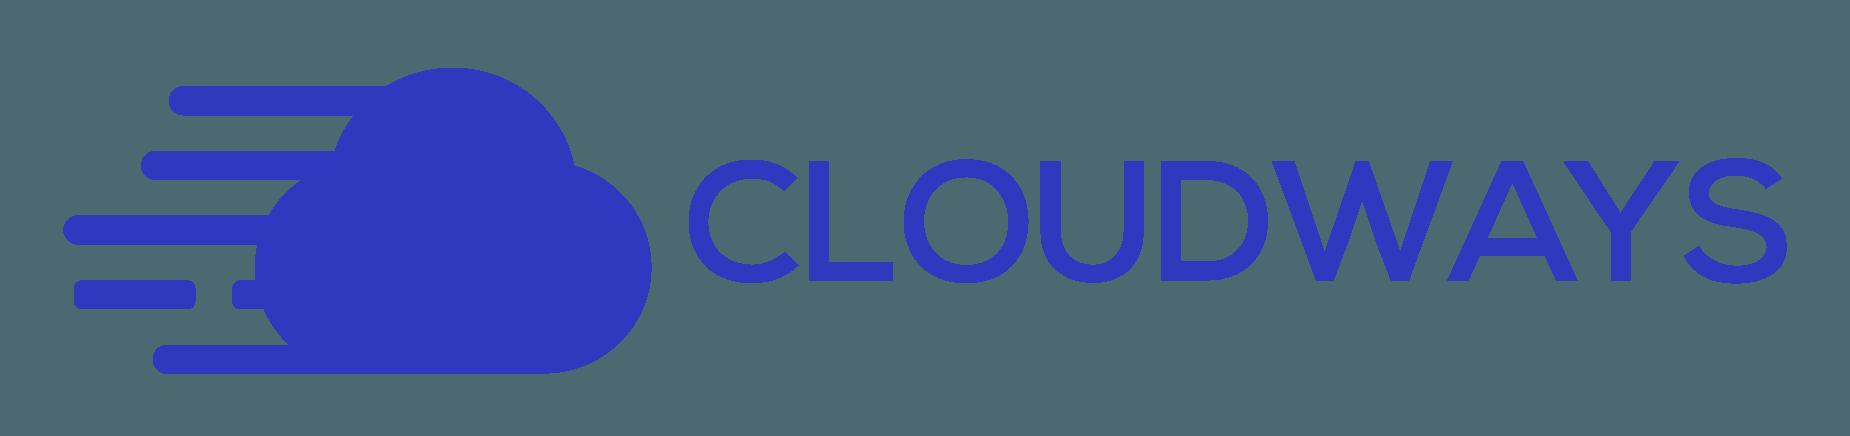 Cloudways-Logo-Inverted-Blue